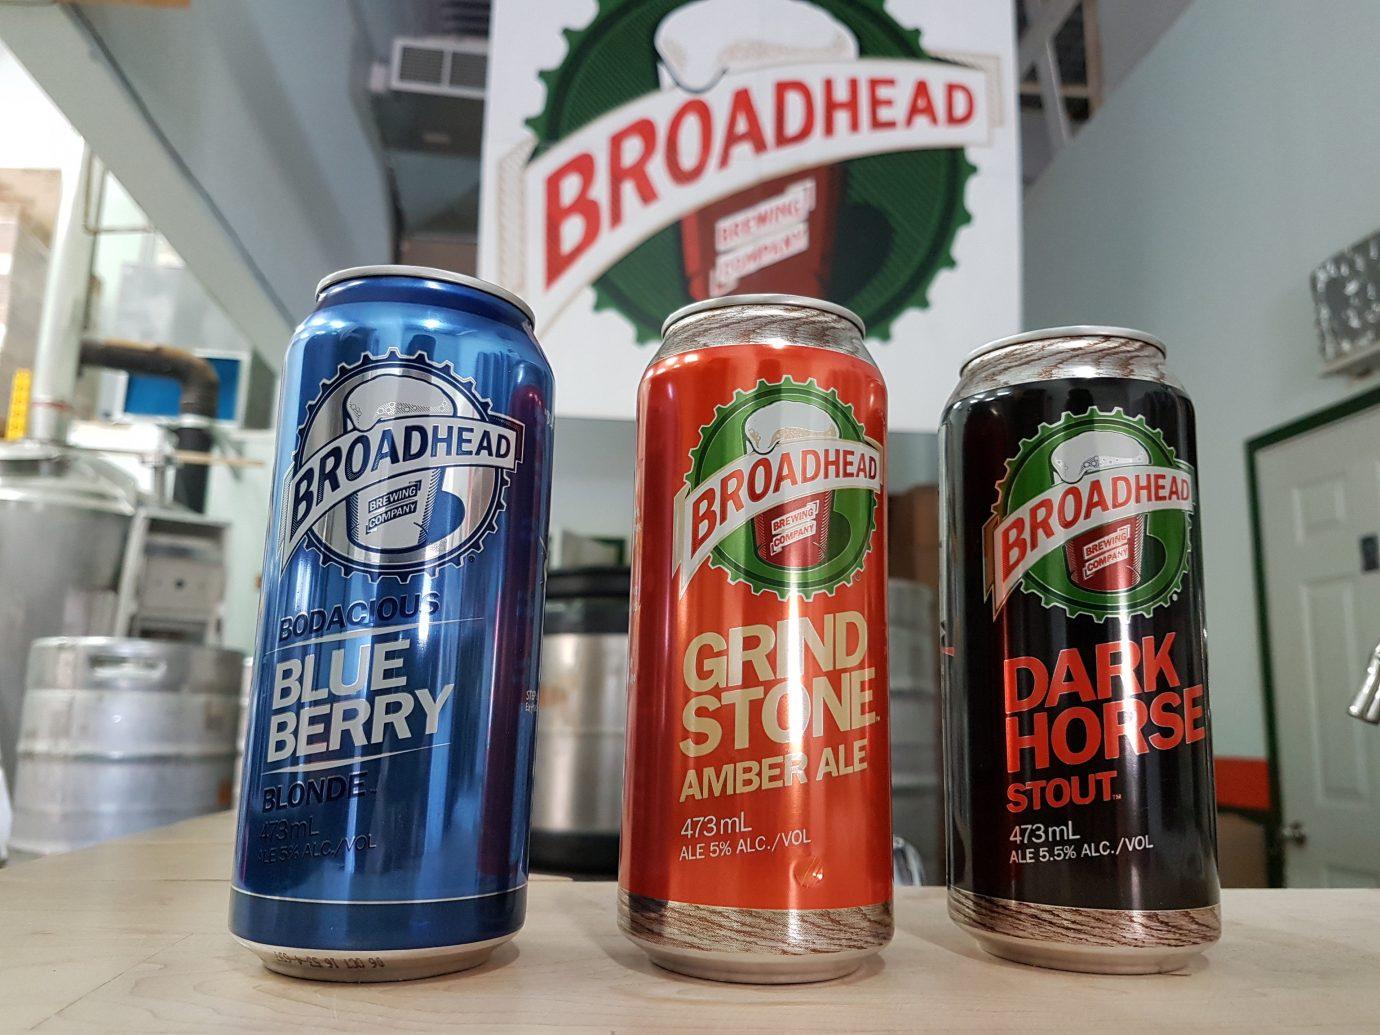 Food + Drink bottle indoor Drink beer counter container can beverage soft drink